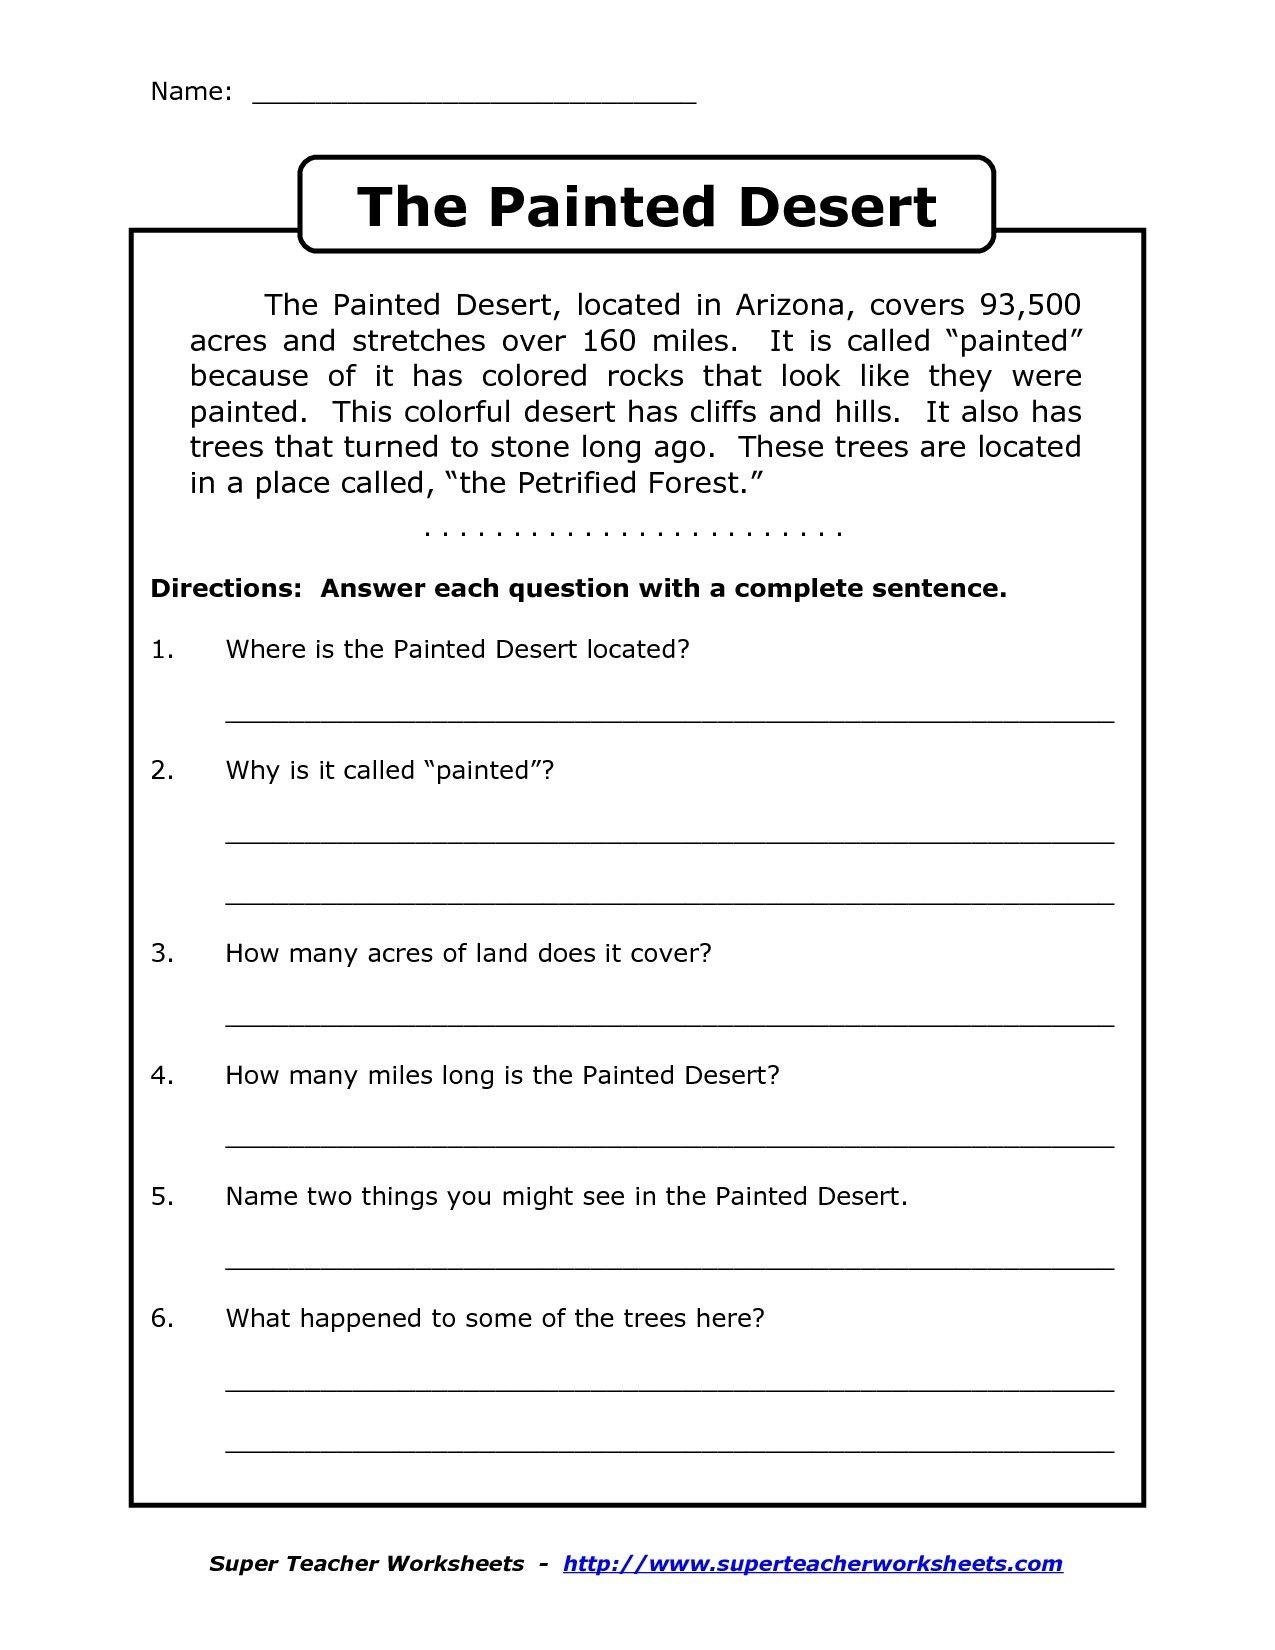 Image Result For Free Printable Worksheets For Grade 4 Comprehension - Free Printable Worksheets Reading Comprehension 5Th Grade